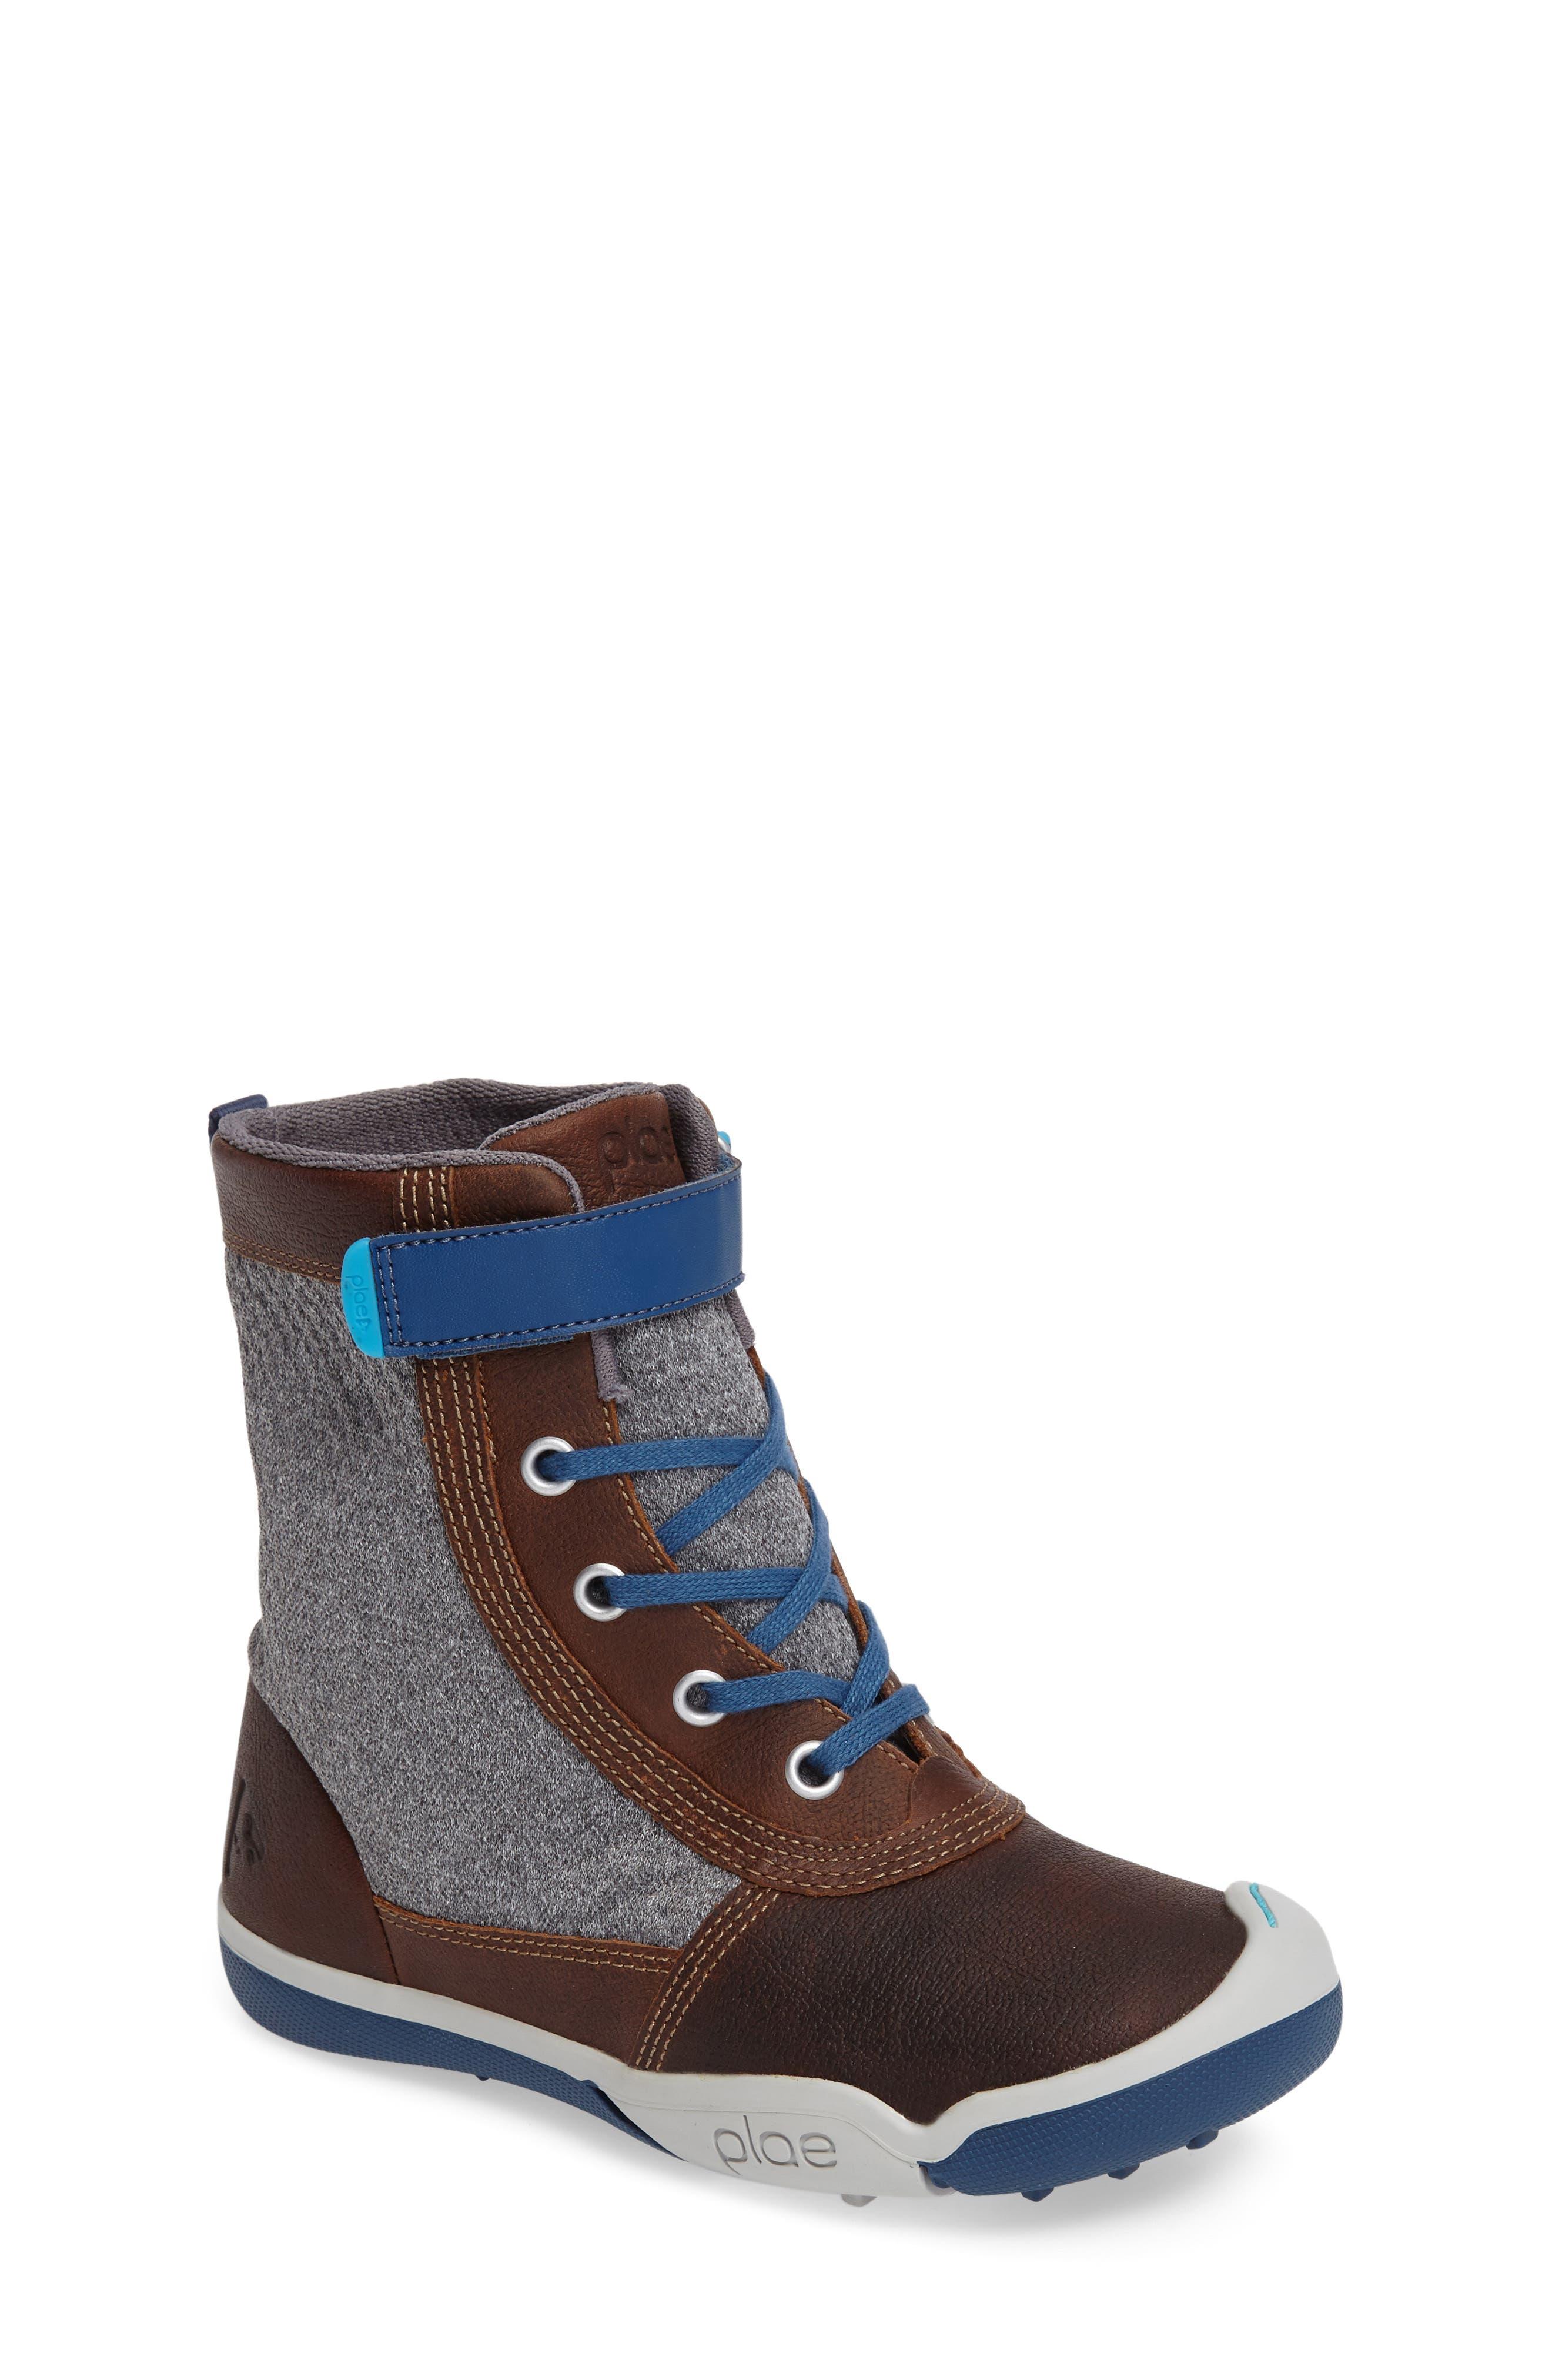 Noel Customizable Boot,                         Main,                         color, 214